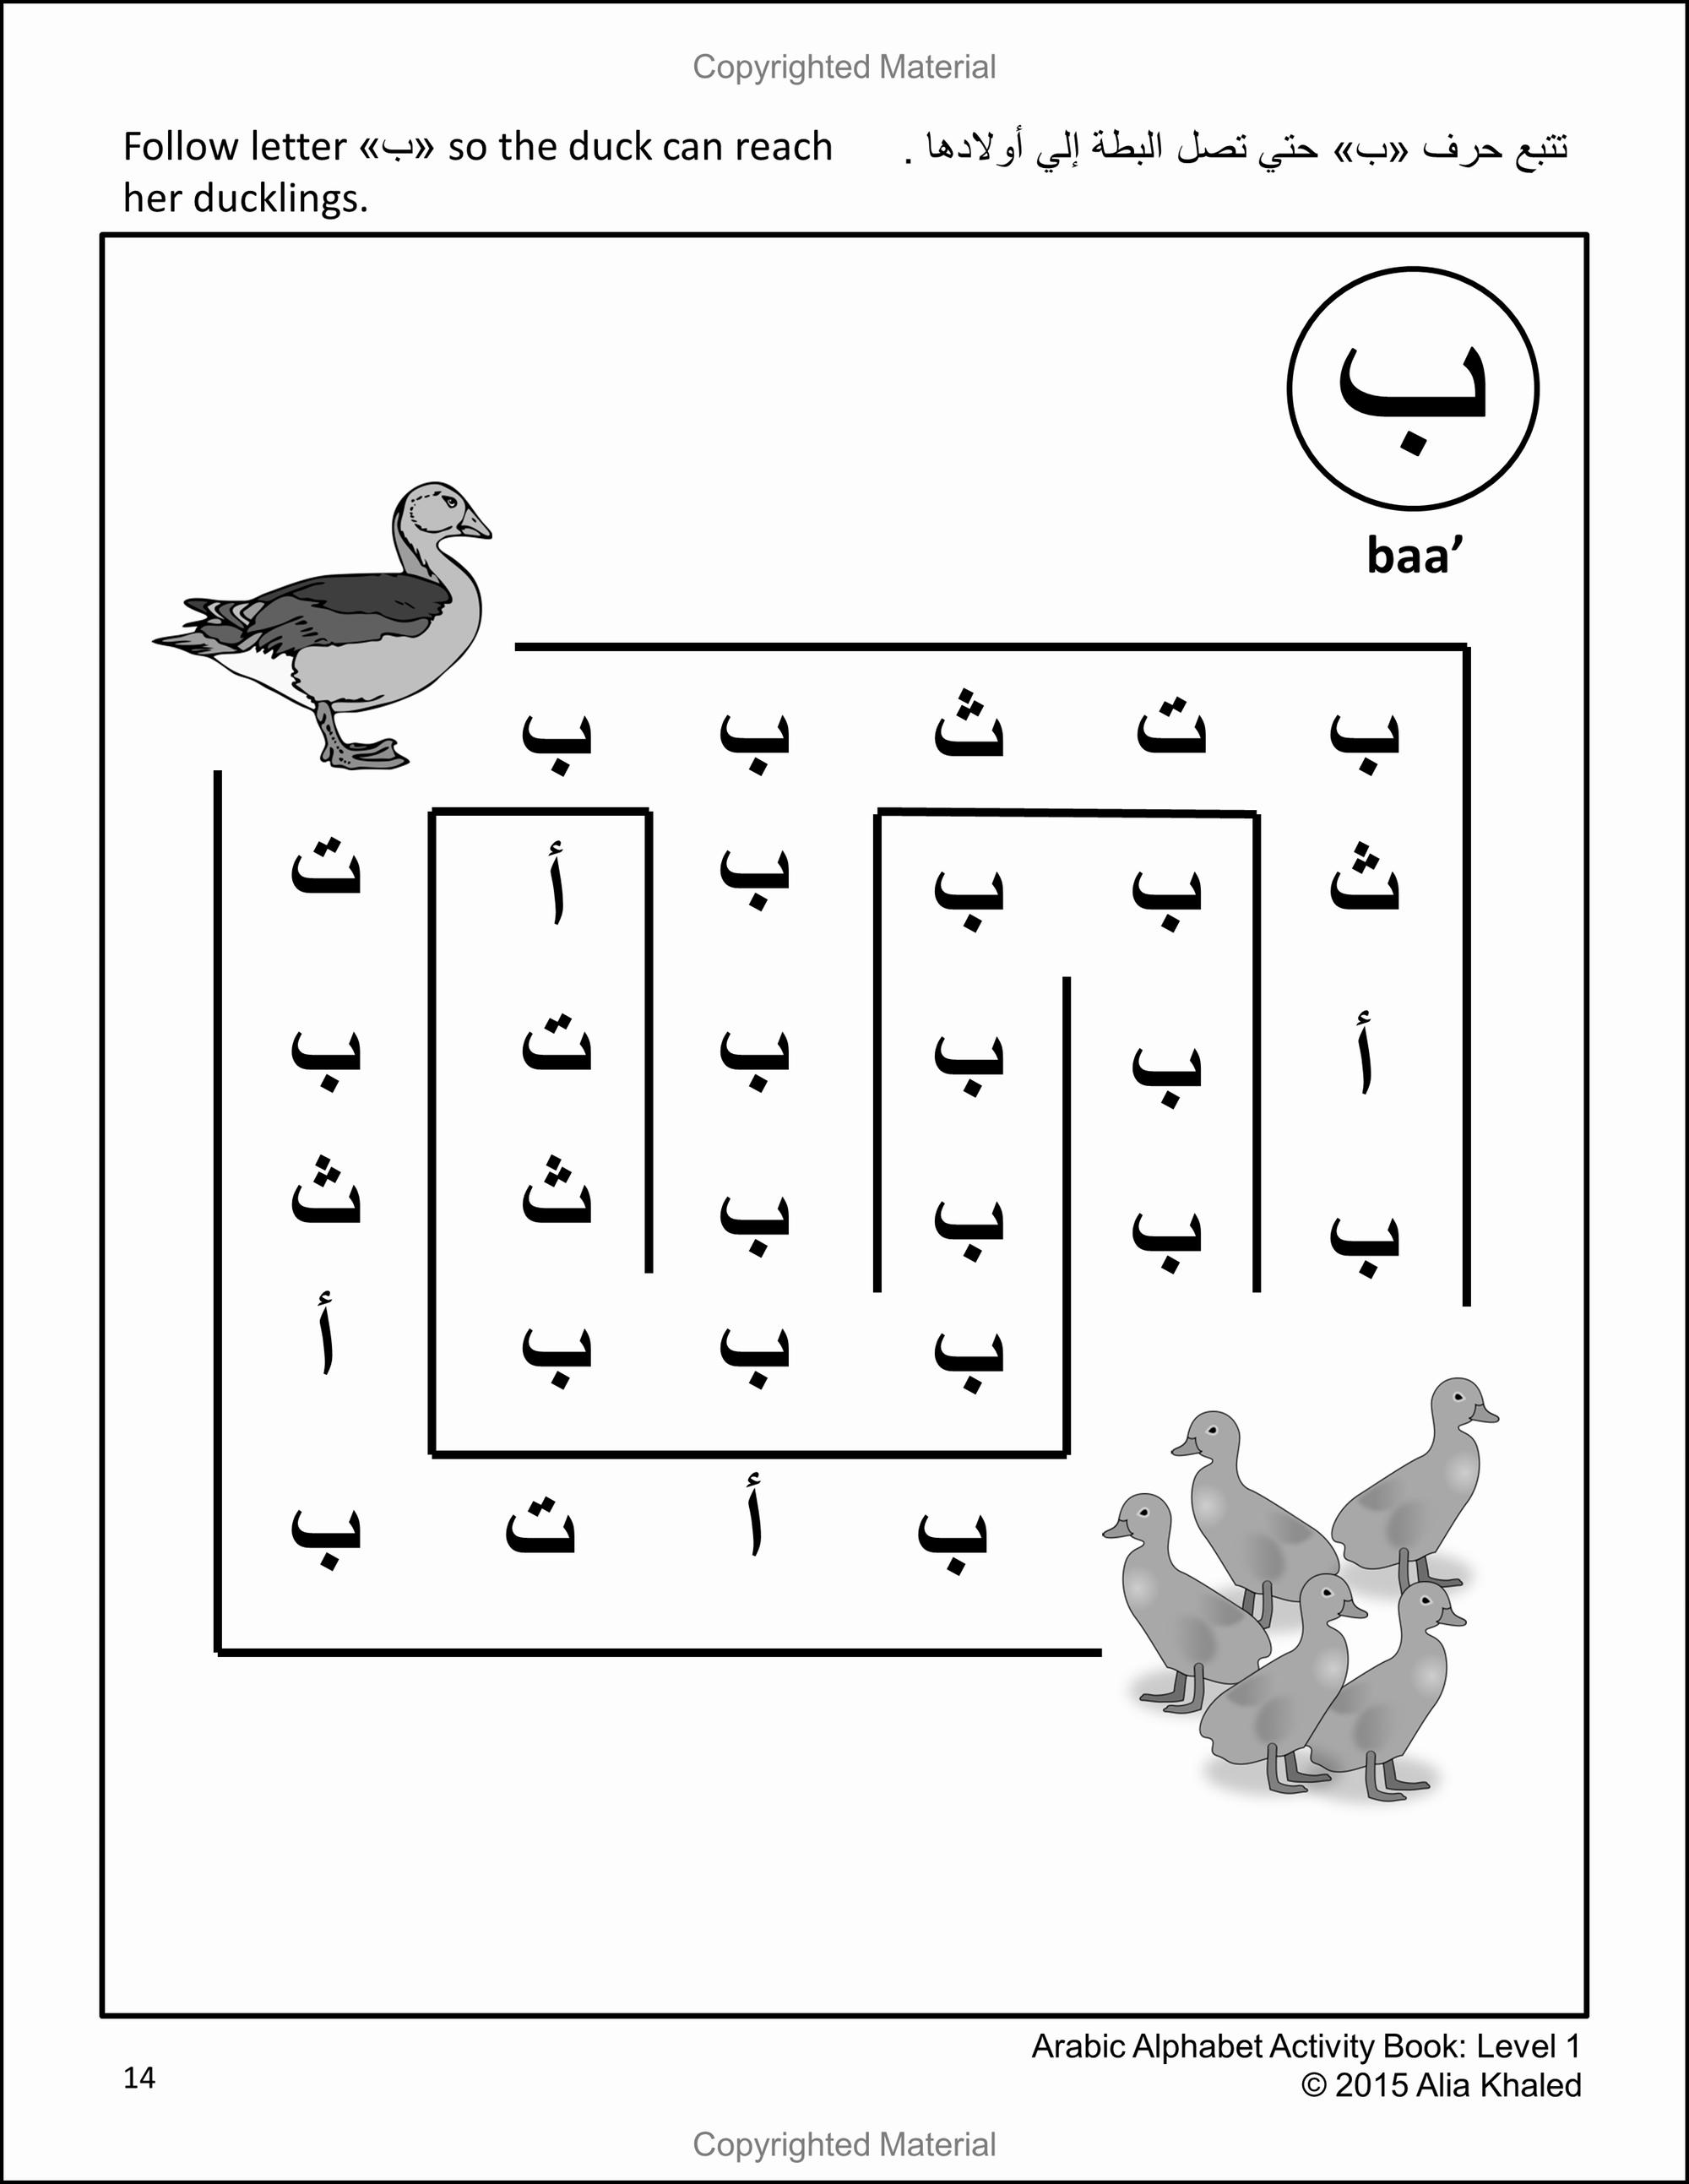 Arabic Teachers Ponnani Work Sheets For Lp Arabic By Learn Arabic Arabic Alphabet Activity Book Arabic Alphabet Alphabet Activities Learning Arabic